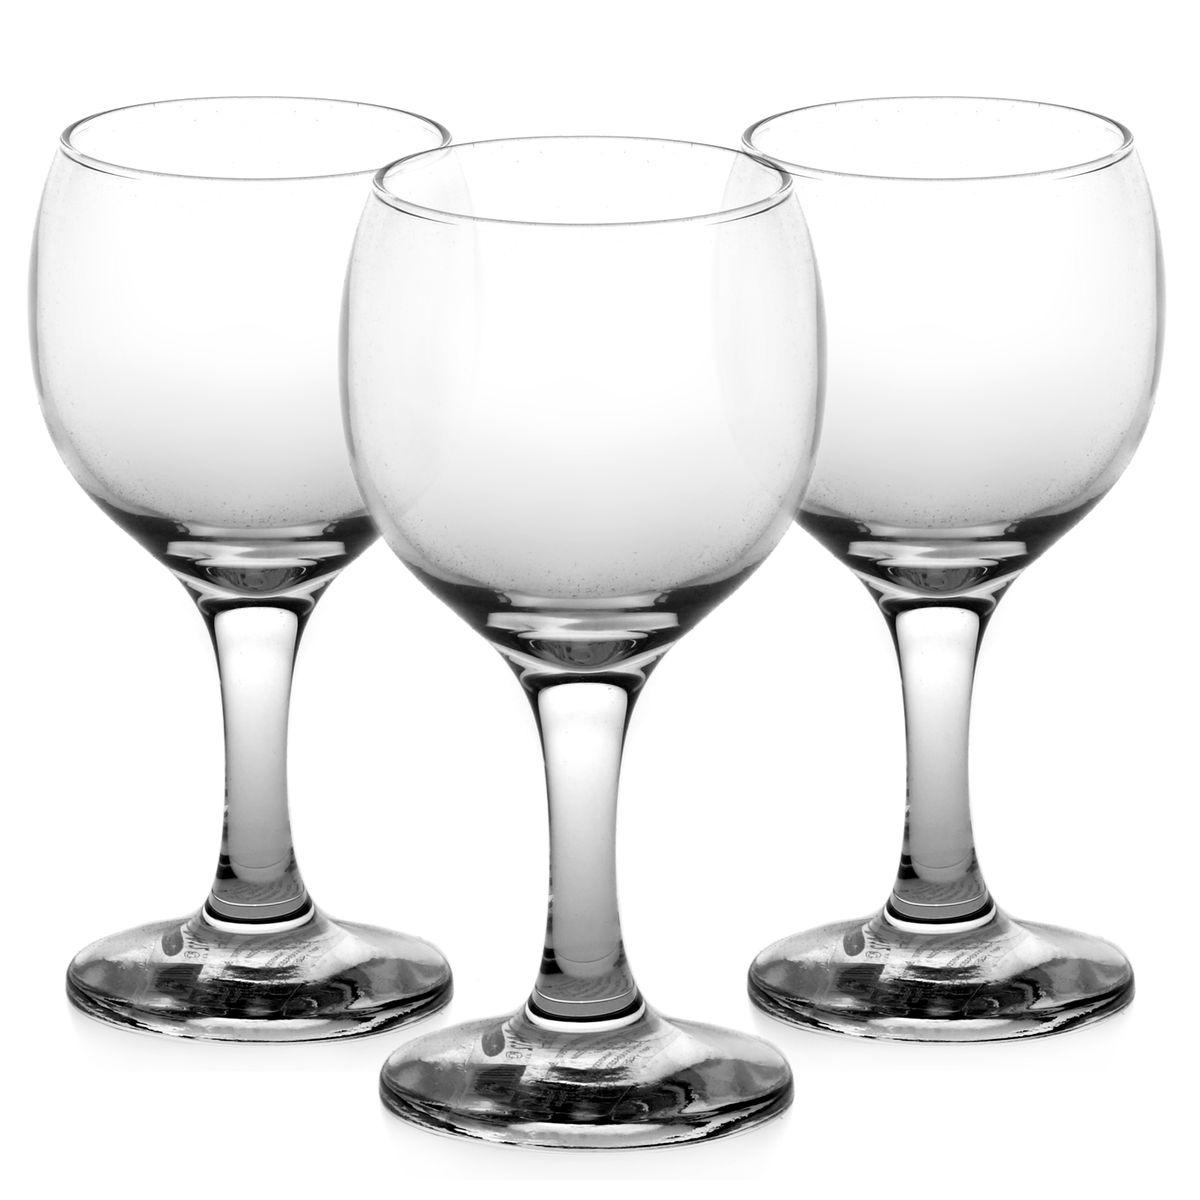 Набор бокалов для белого вина Pasabahce Bistro, 175 мл, 3 шт набор бокалов для бренди коралл 40600 q8105 400 анжела